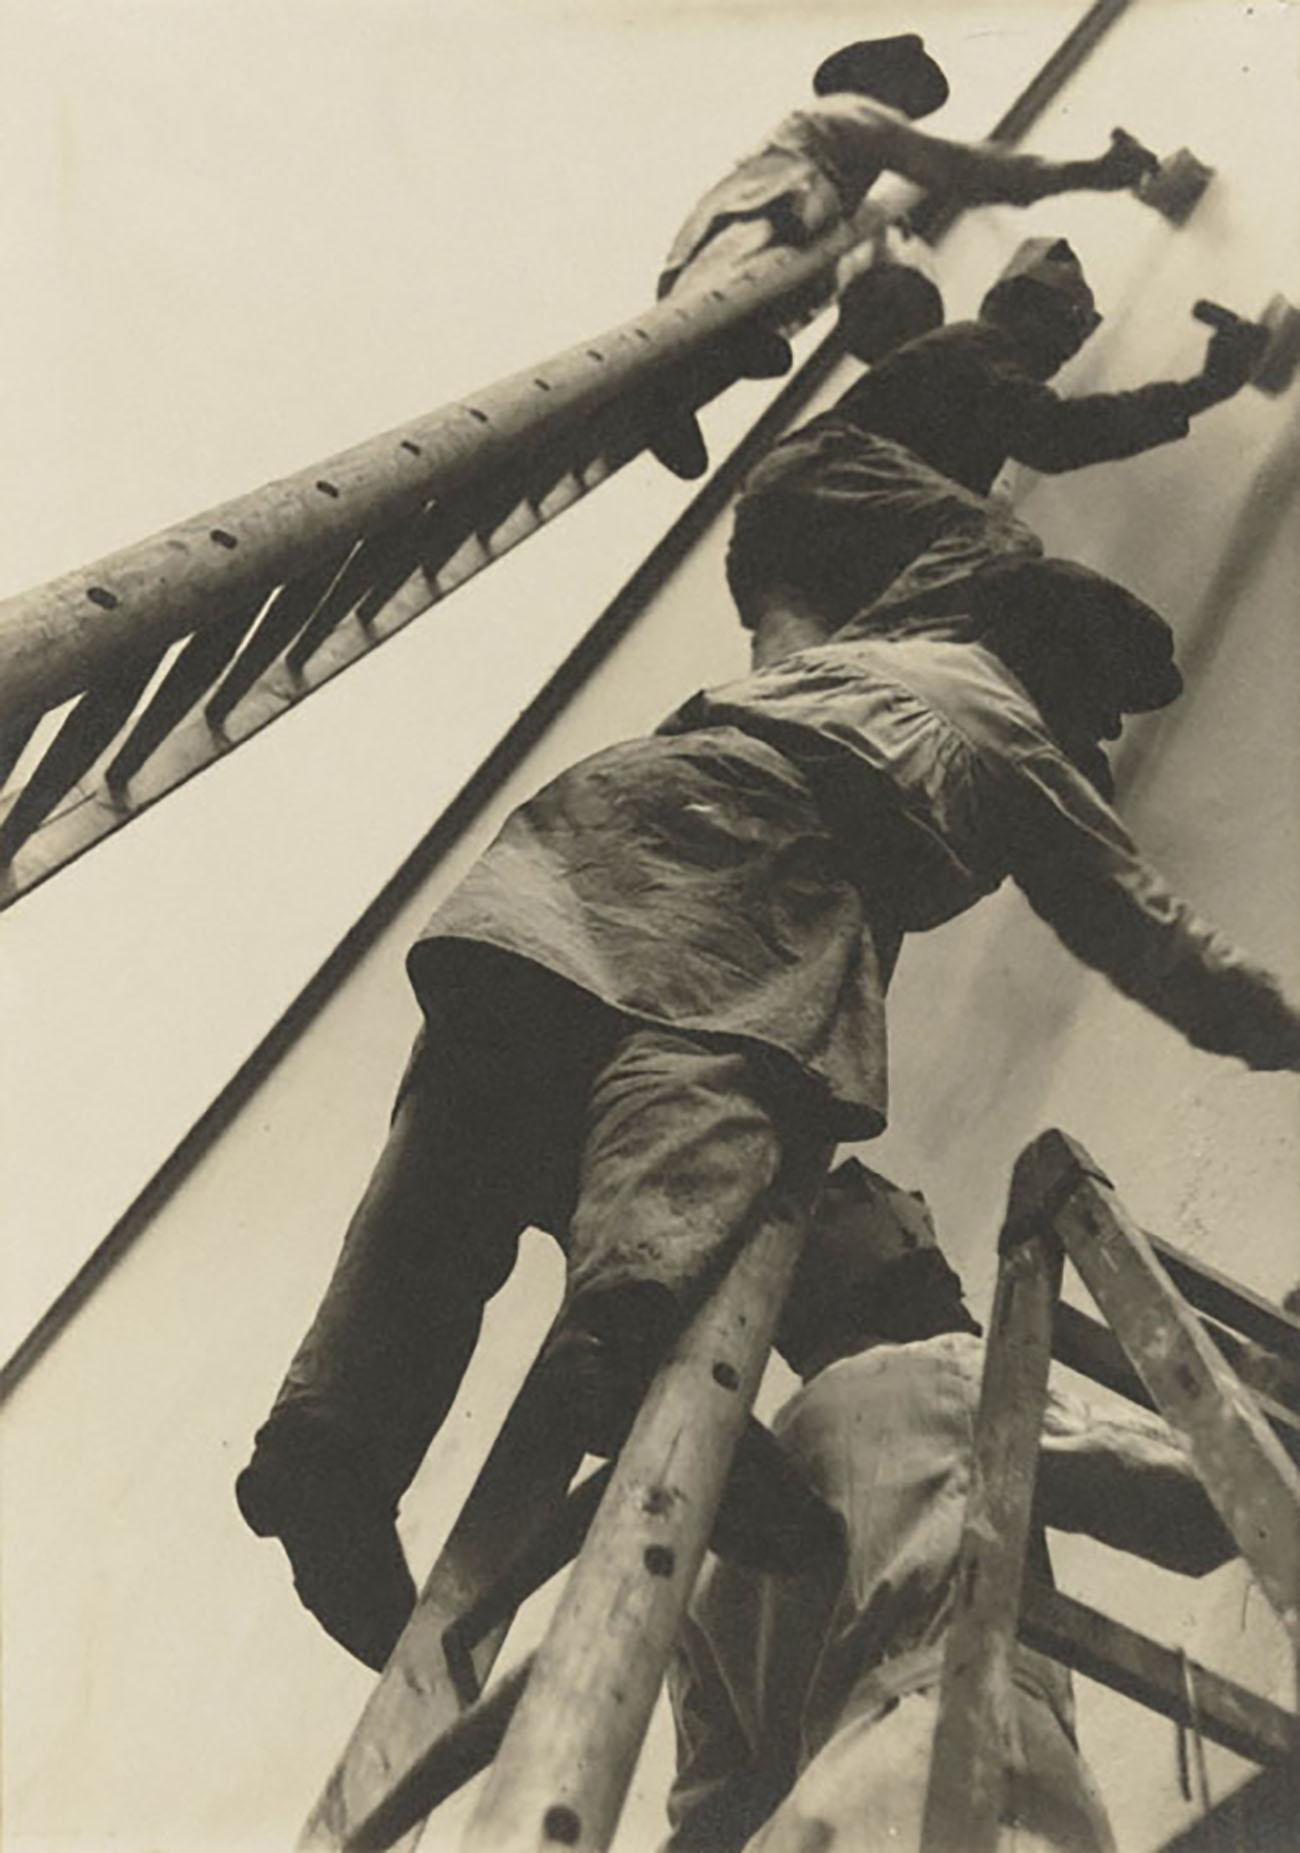 Gertrud Arndt, 1929-30, Gelatinedruck mit Silbersalz. Thomas Walther Collection. Gift of Thomas Walther © 2021, Pro Litteris, Zürich Digital Image © 2021 The Museum of Modern Art, New York/Scala, Florence